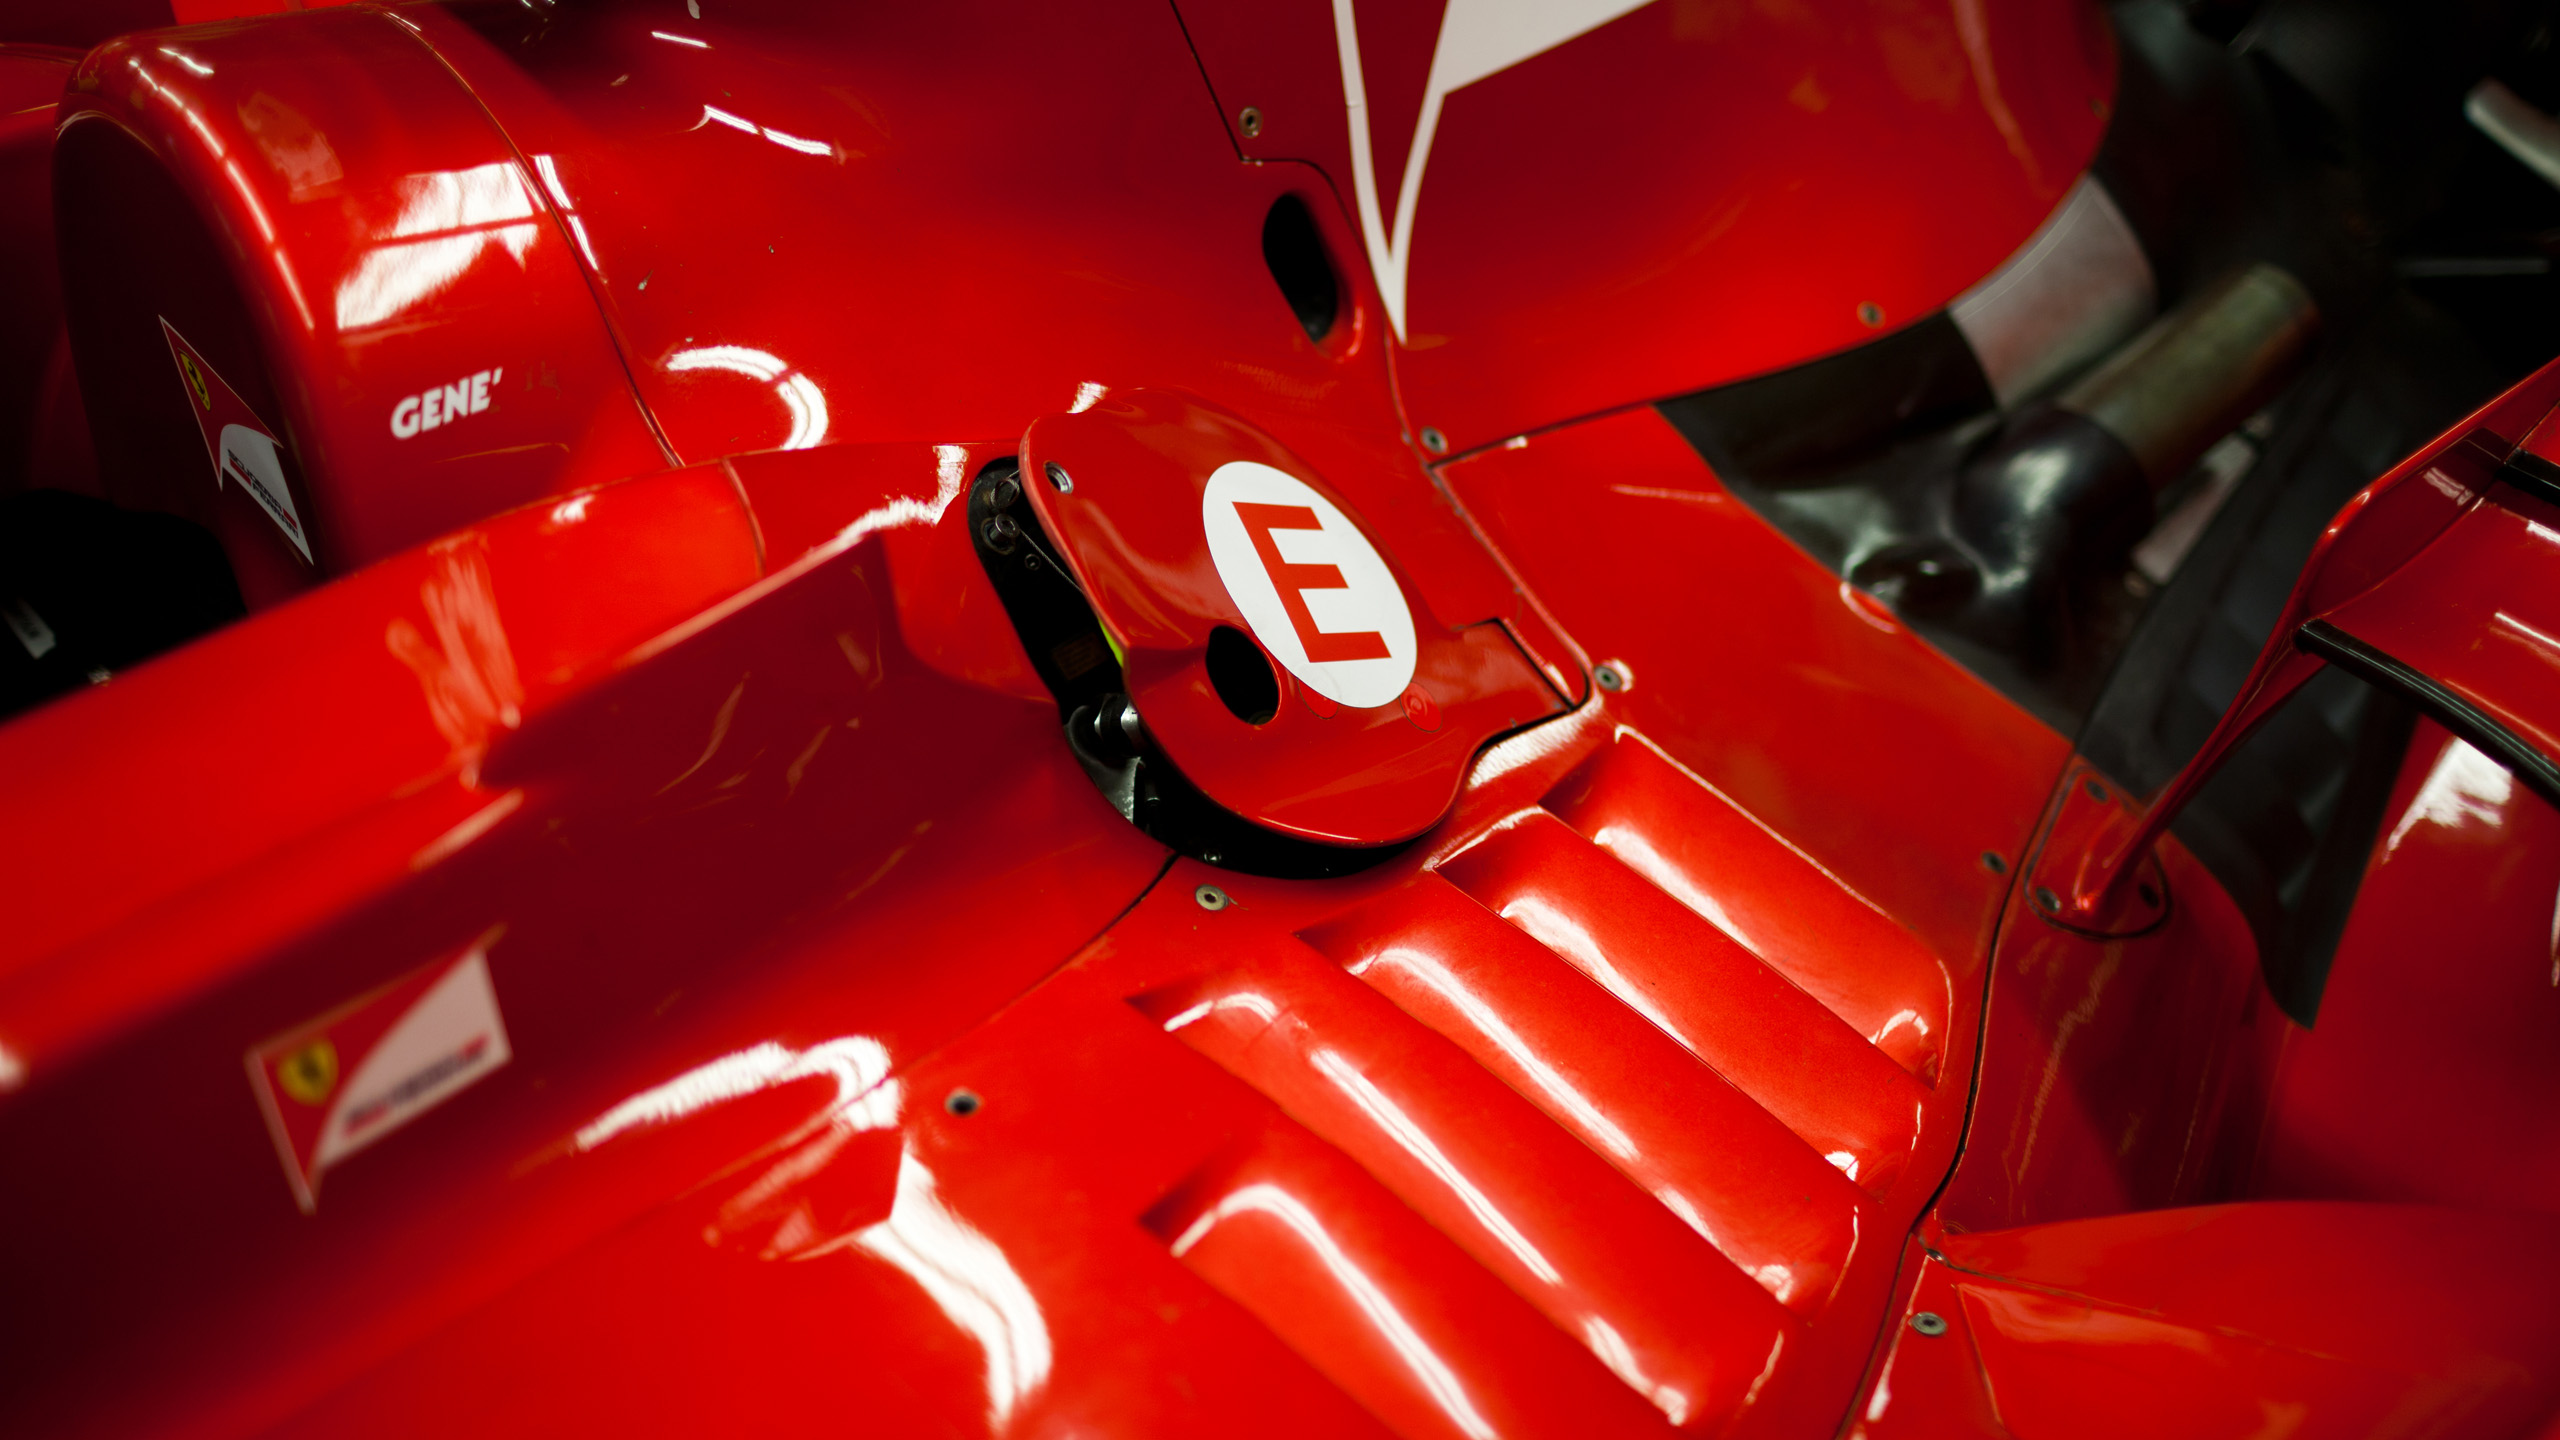 Фото, формула-1, машина красная, обои на рабочий стол, феррари, ferrari